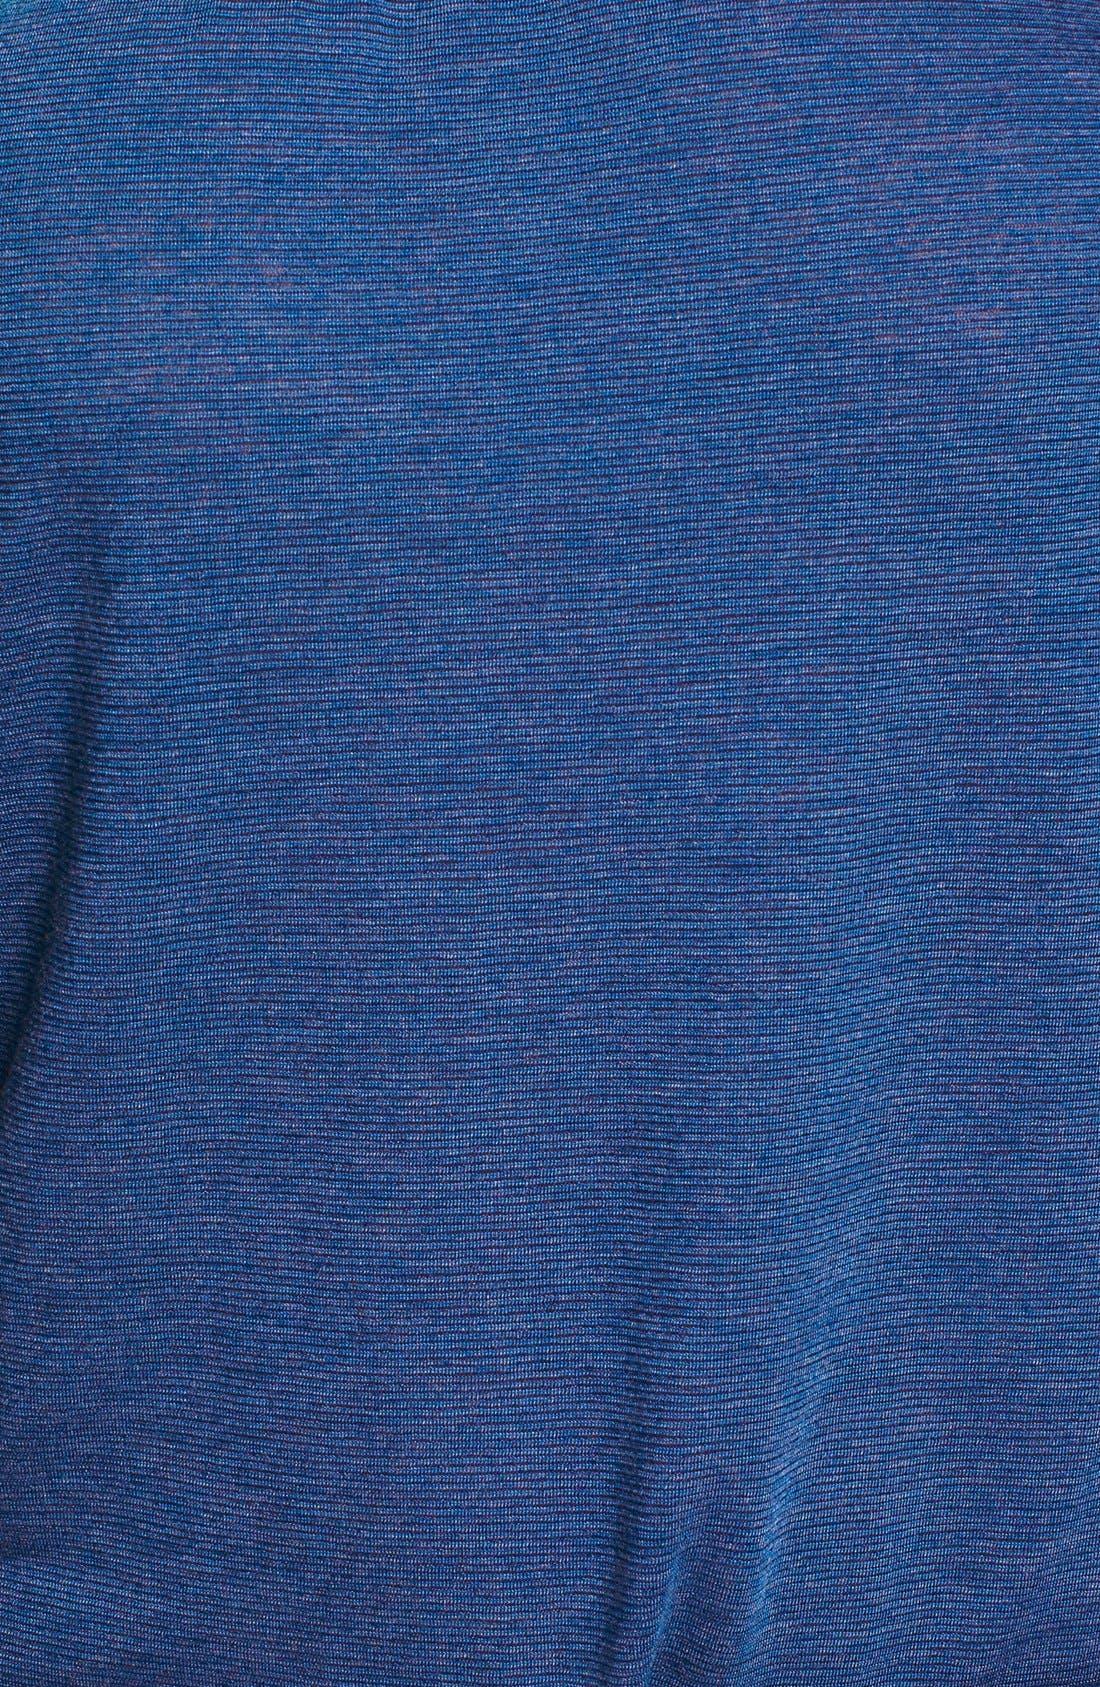 Alternate Image 3  - BCA Heathered Strapless Cover-Up Romper